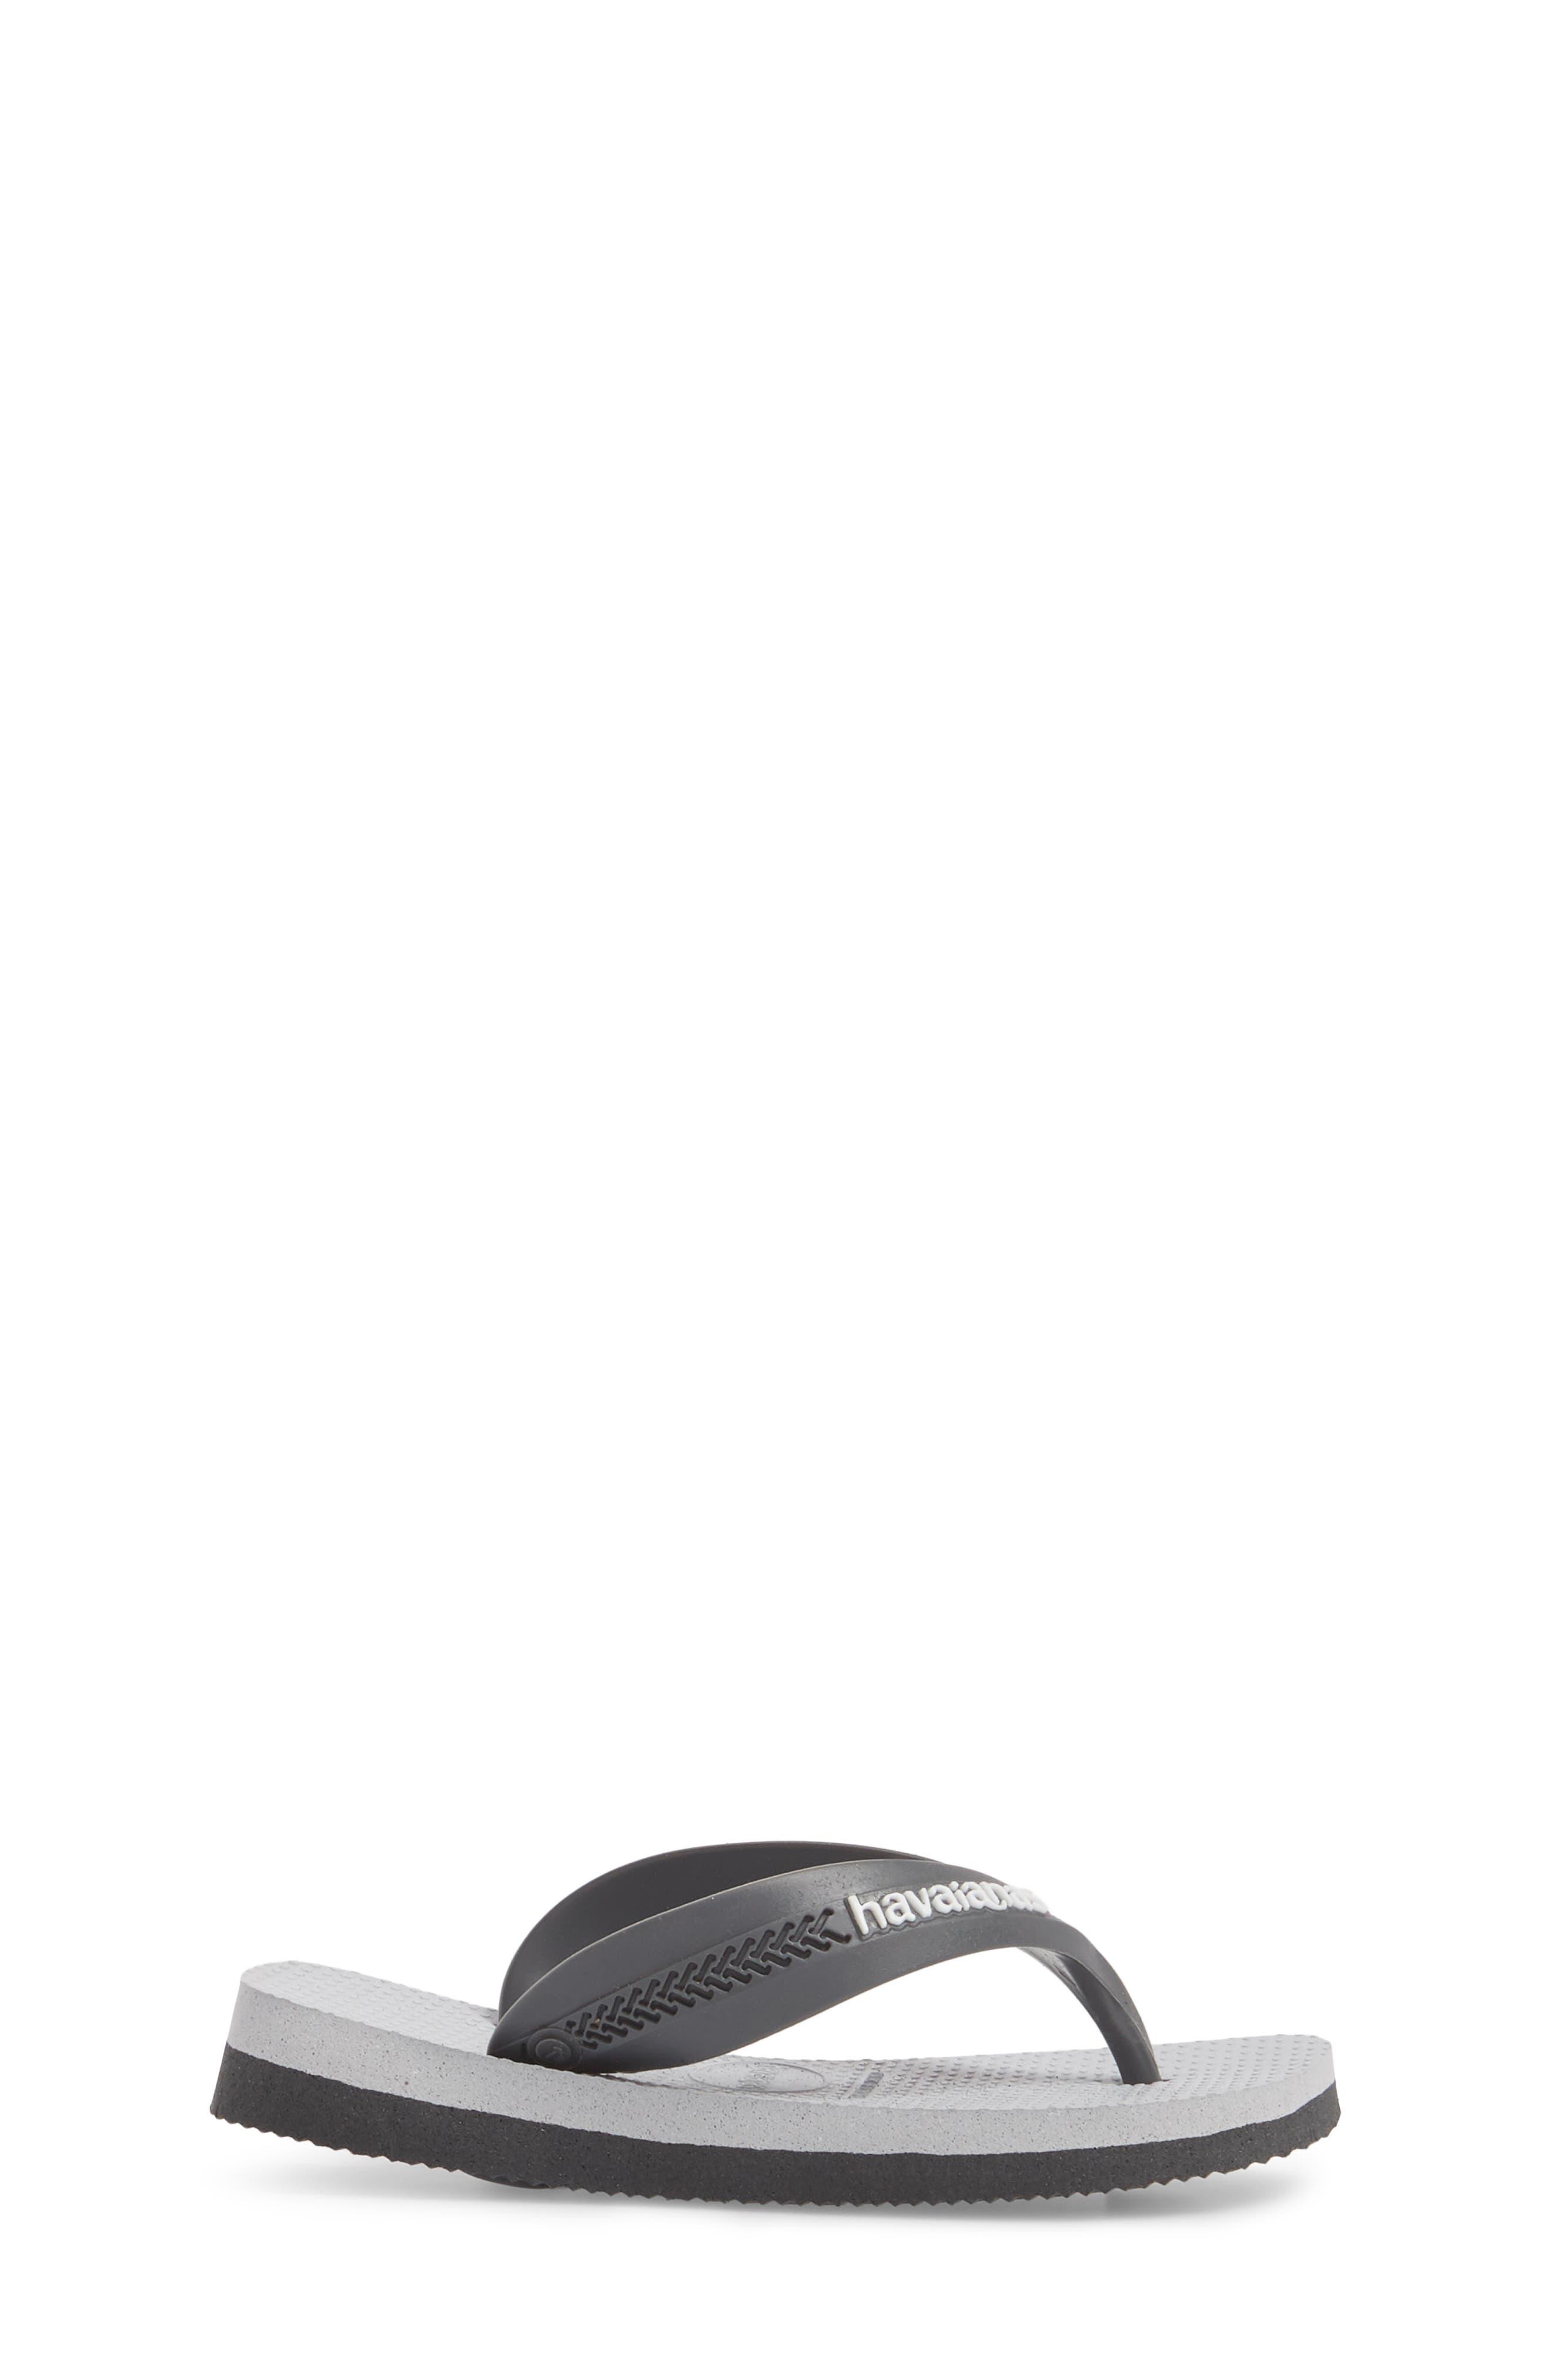 'Max' Flip-Flop,                             Alternate thumbnail 3, color,                             Graphite/ Ice Grey